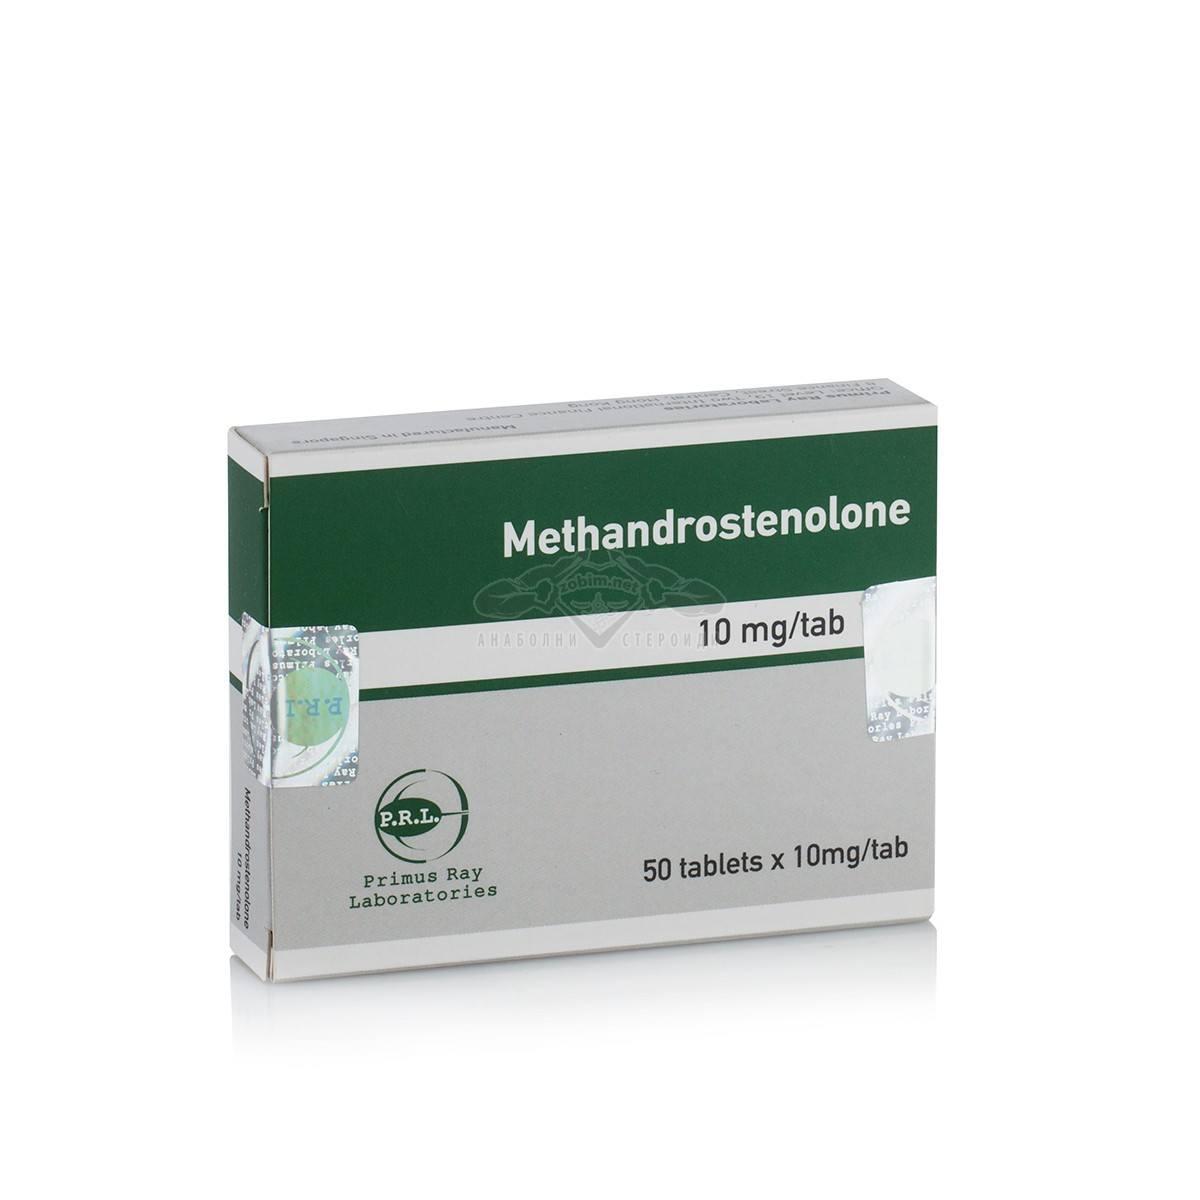 Methandrostenolone (Метан) – 50 табл. х 10 мг.